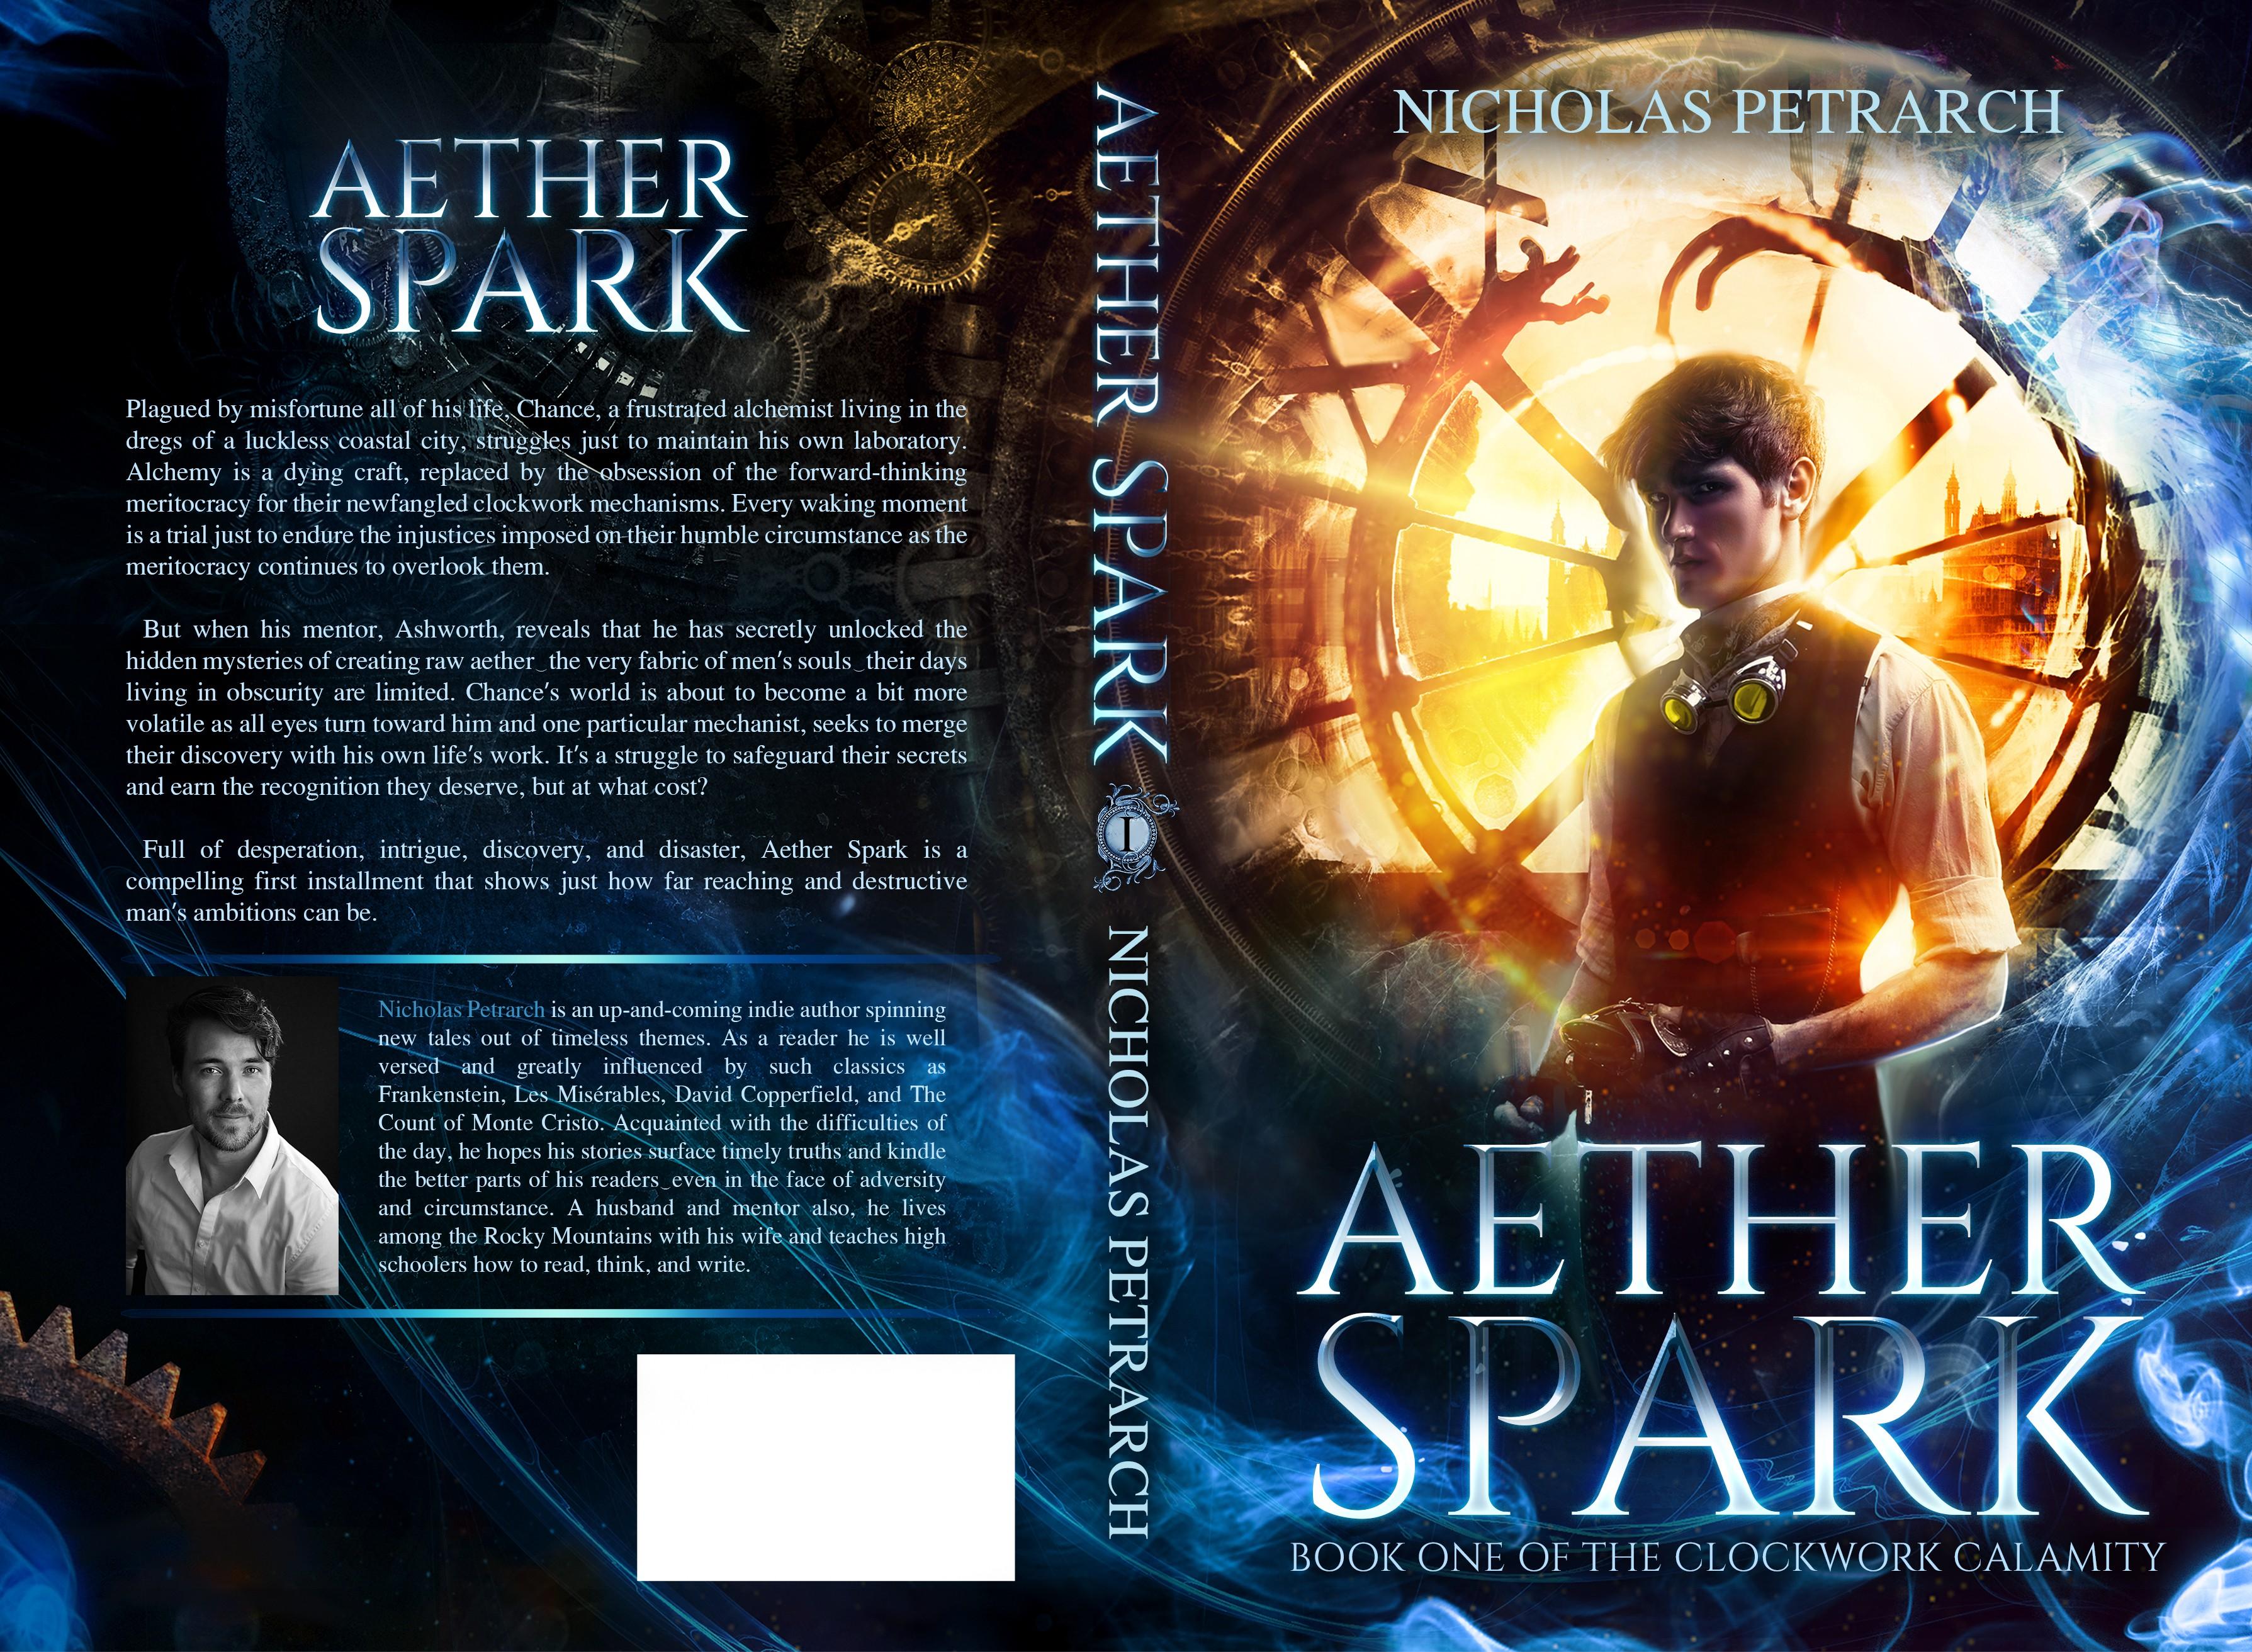 Create a steampunk/sci-fi/thriller book cover (first of a series)